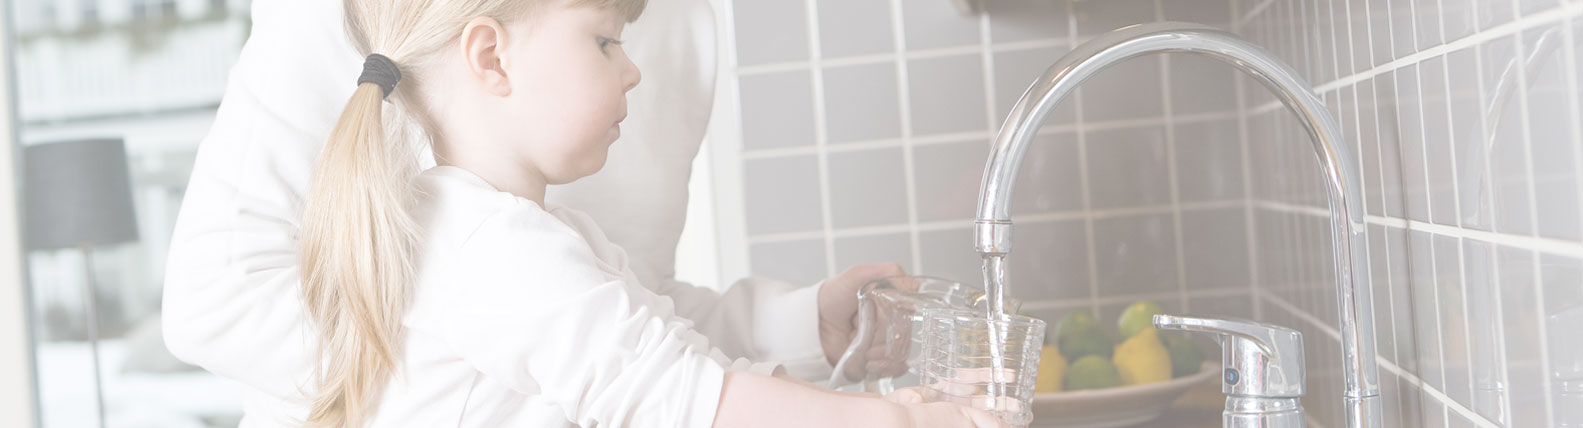 Child Filling Water Jug